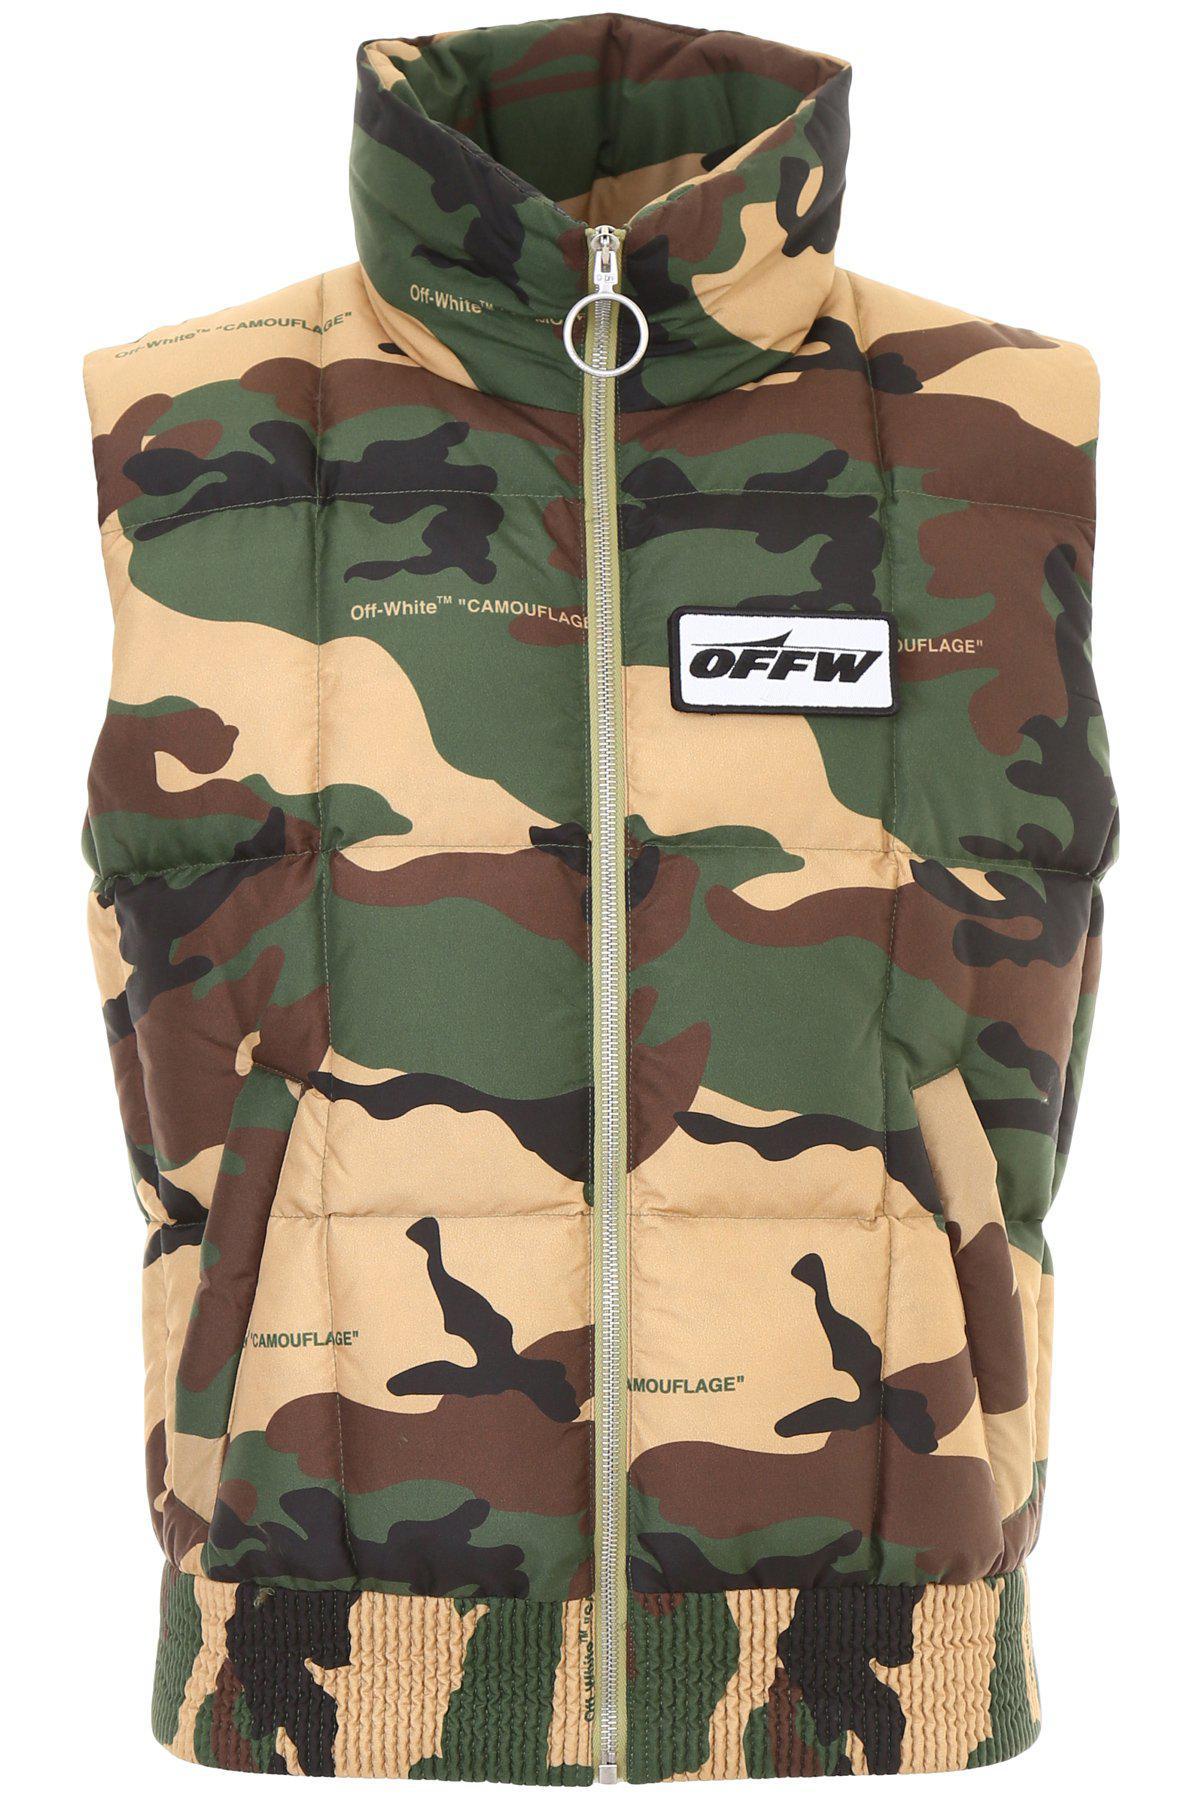 1c8cc1c0b97f3 Off-White c/o Virgil Abloh Camouflage Padded Vest in Green for Men ...